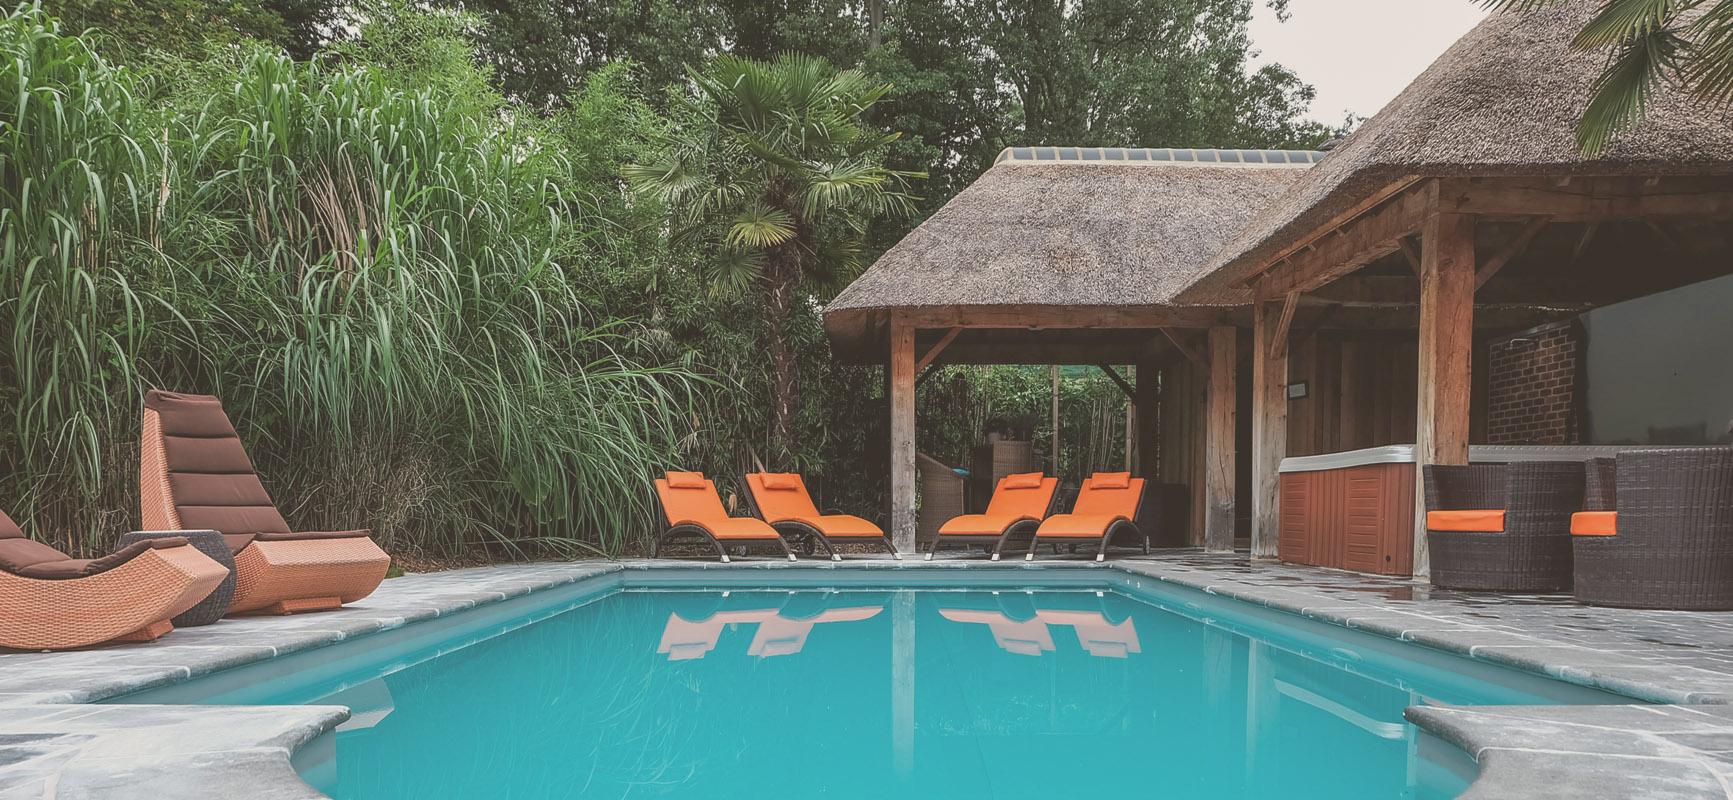 Topwellness Privé Sauna & Wellness Relax Bourgondia